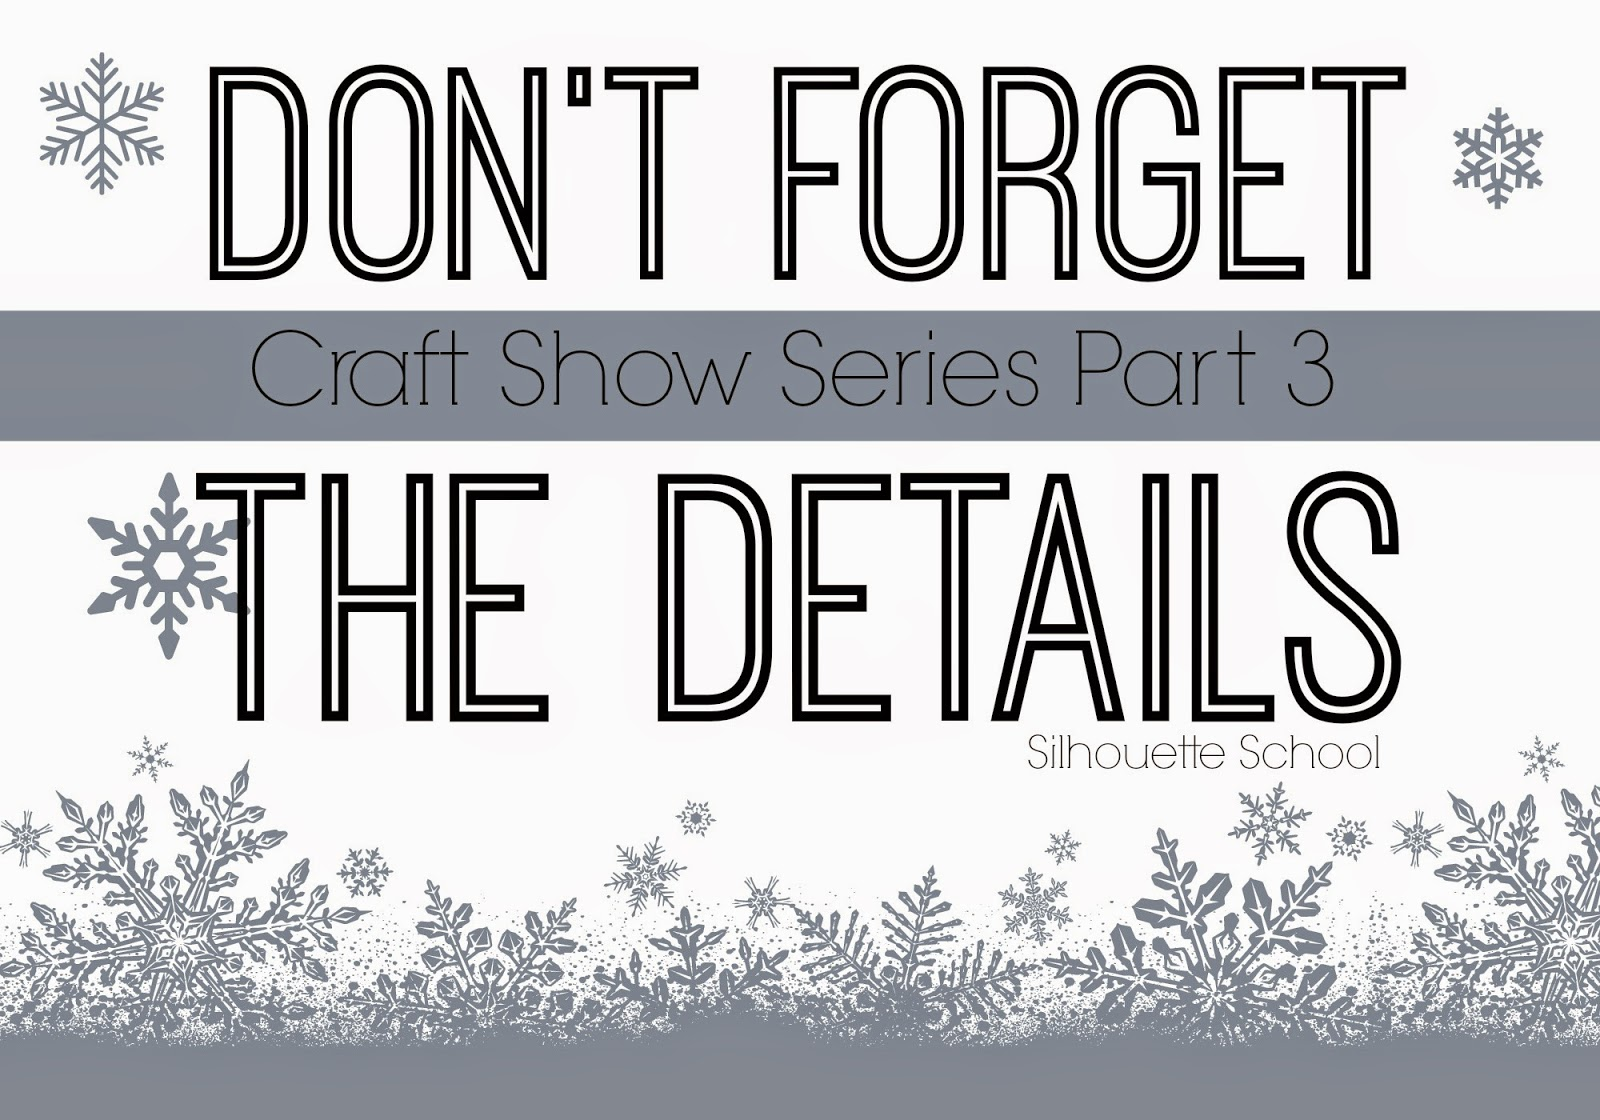 Craft show, details